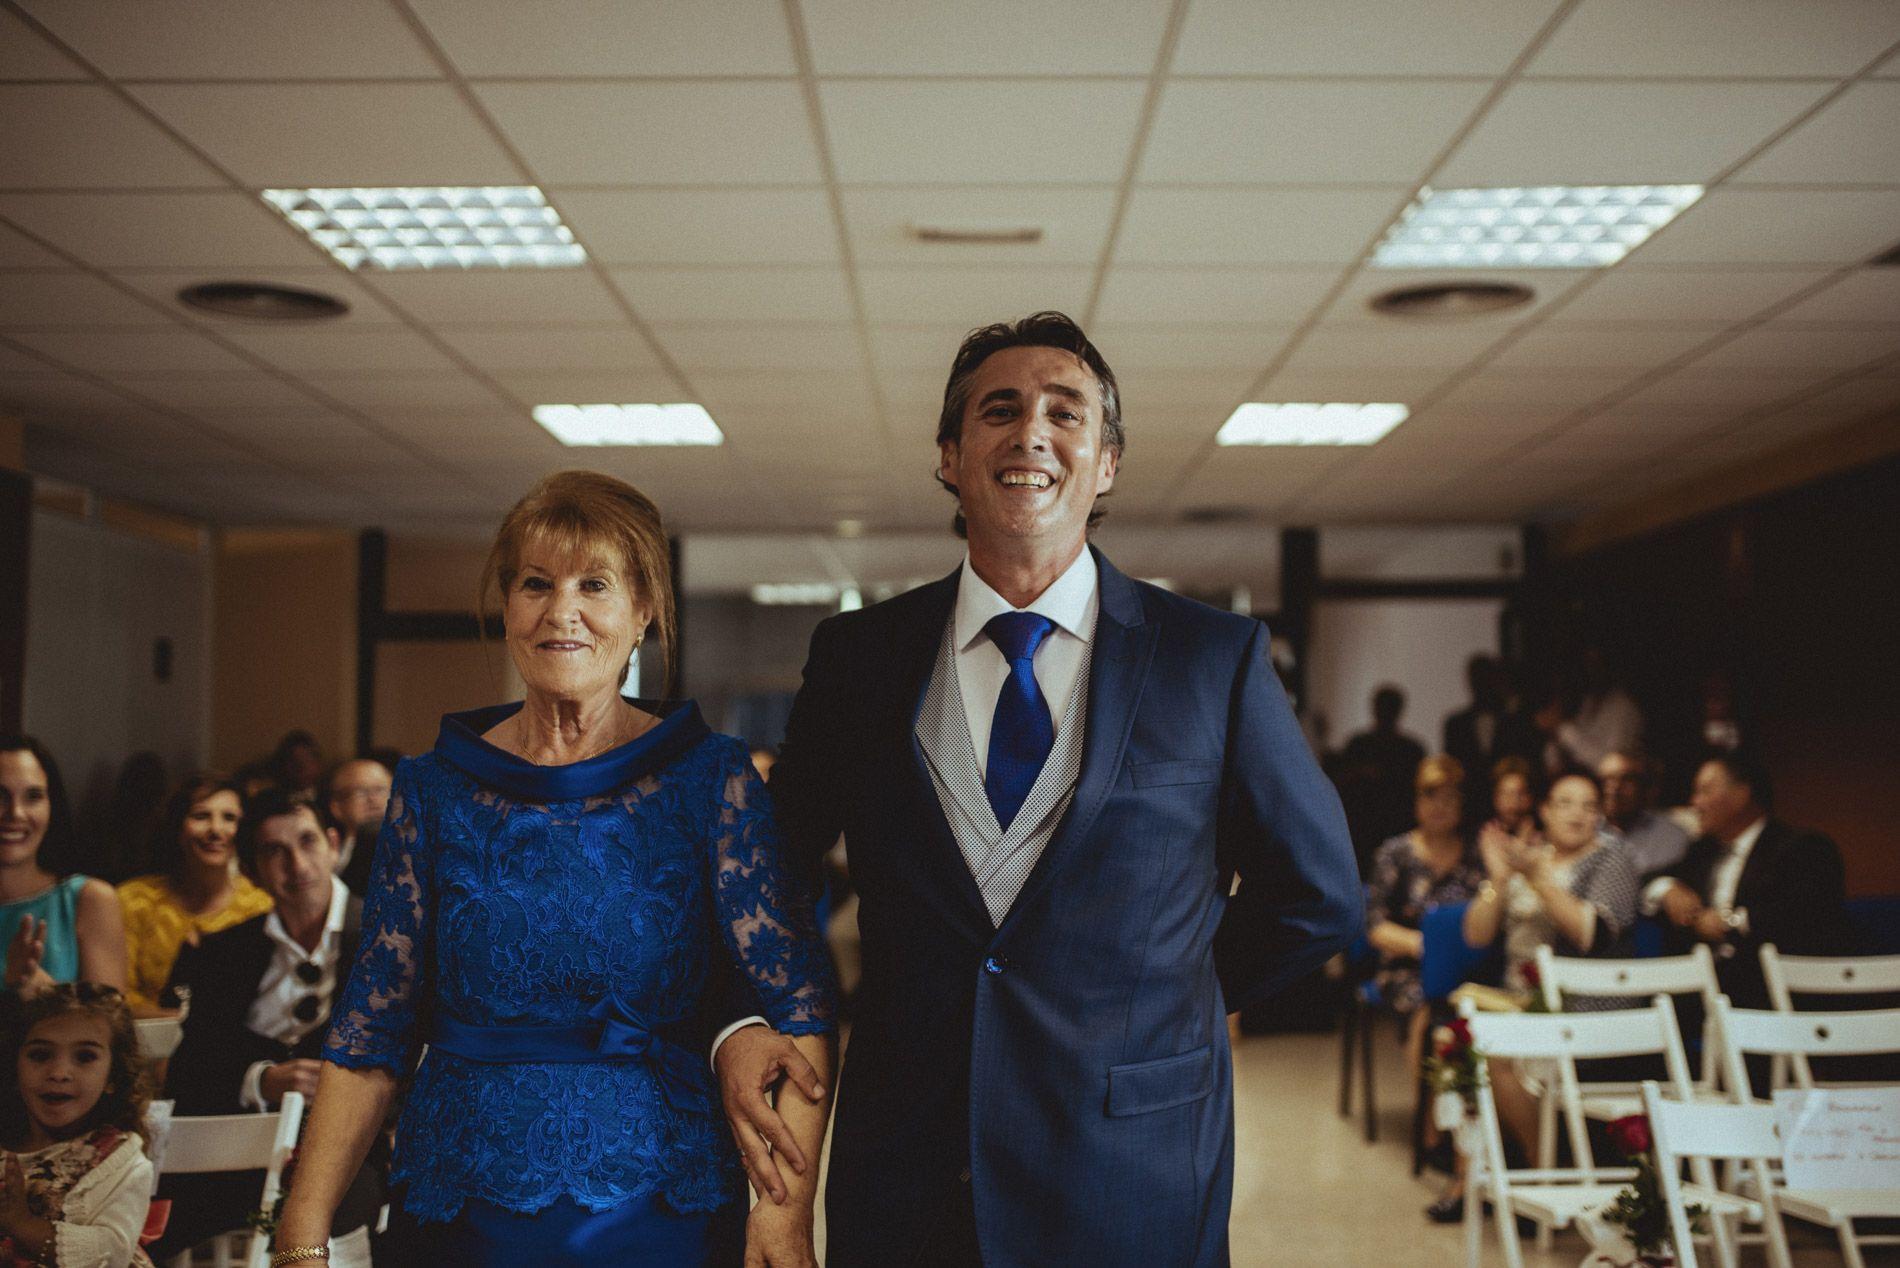 fotografia-boda-santi-miquel-bj-020